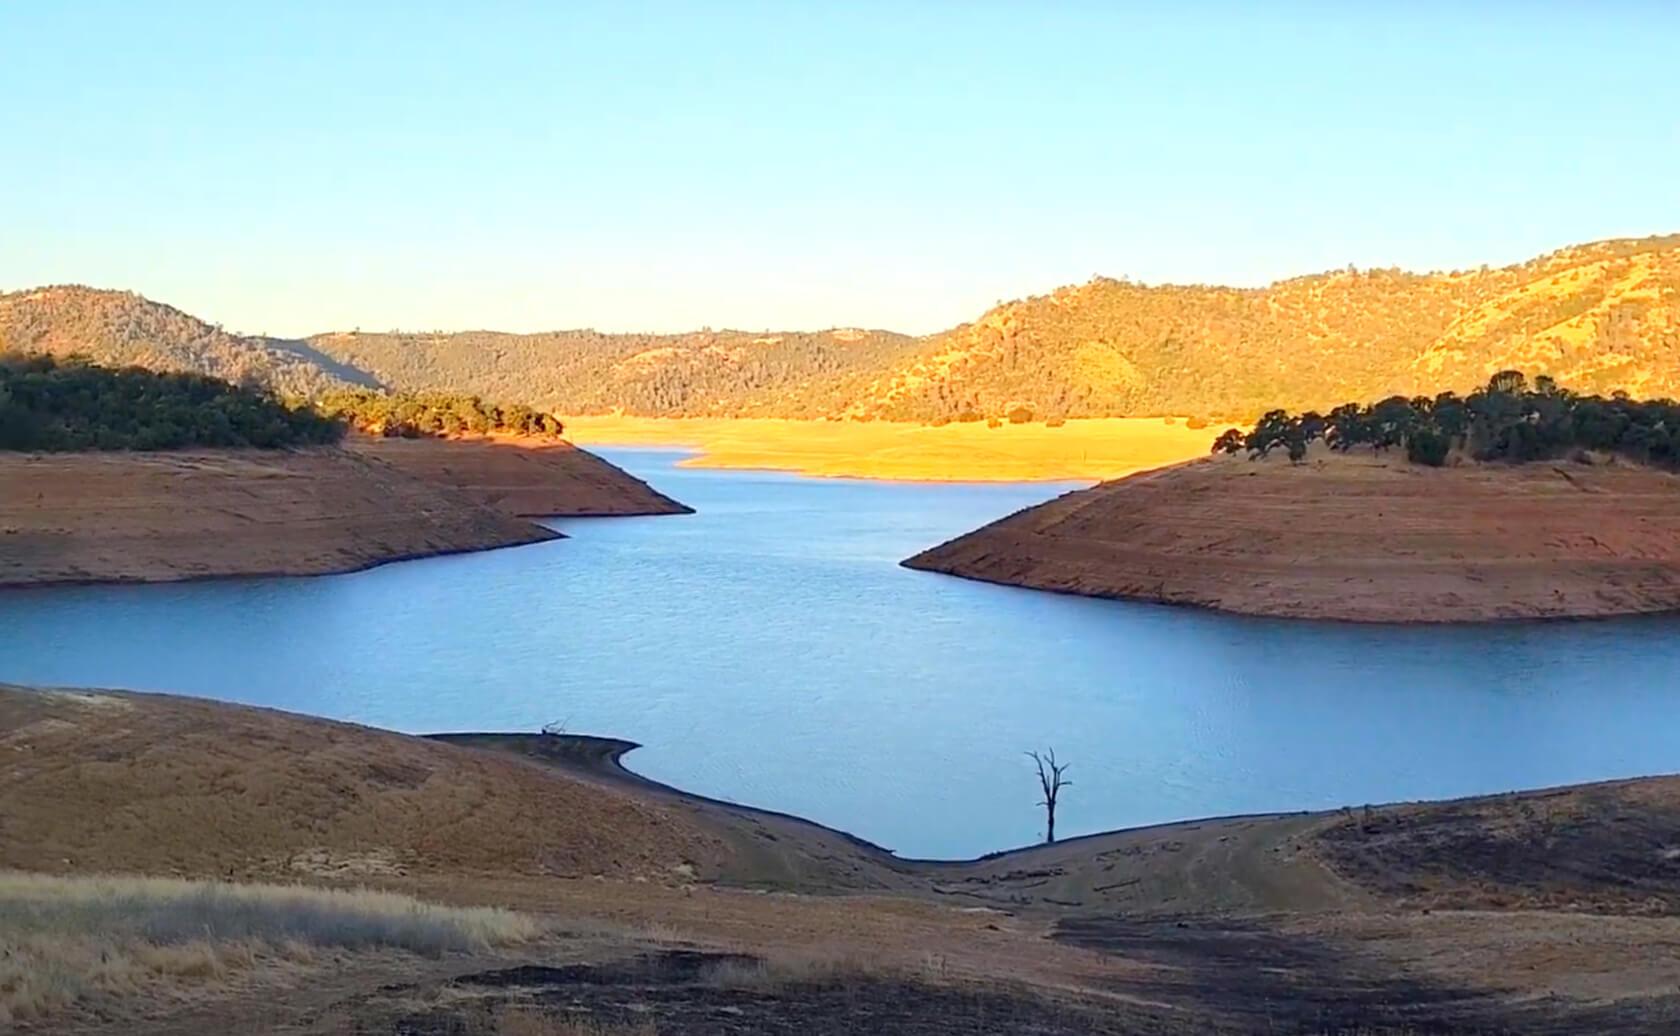 New-Melones-Lake-Fishing-Guide-Report-California-09